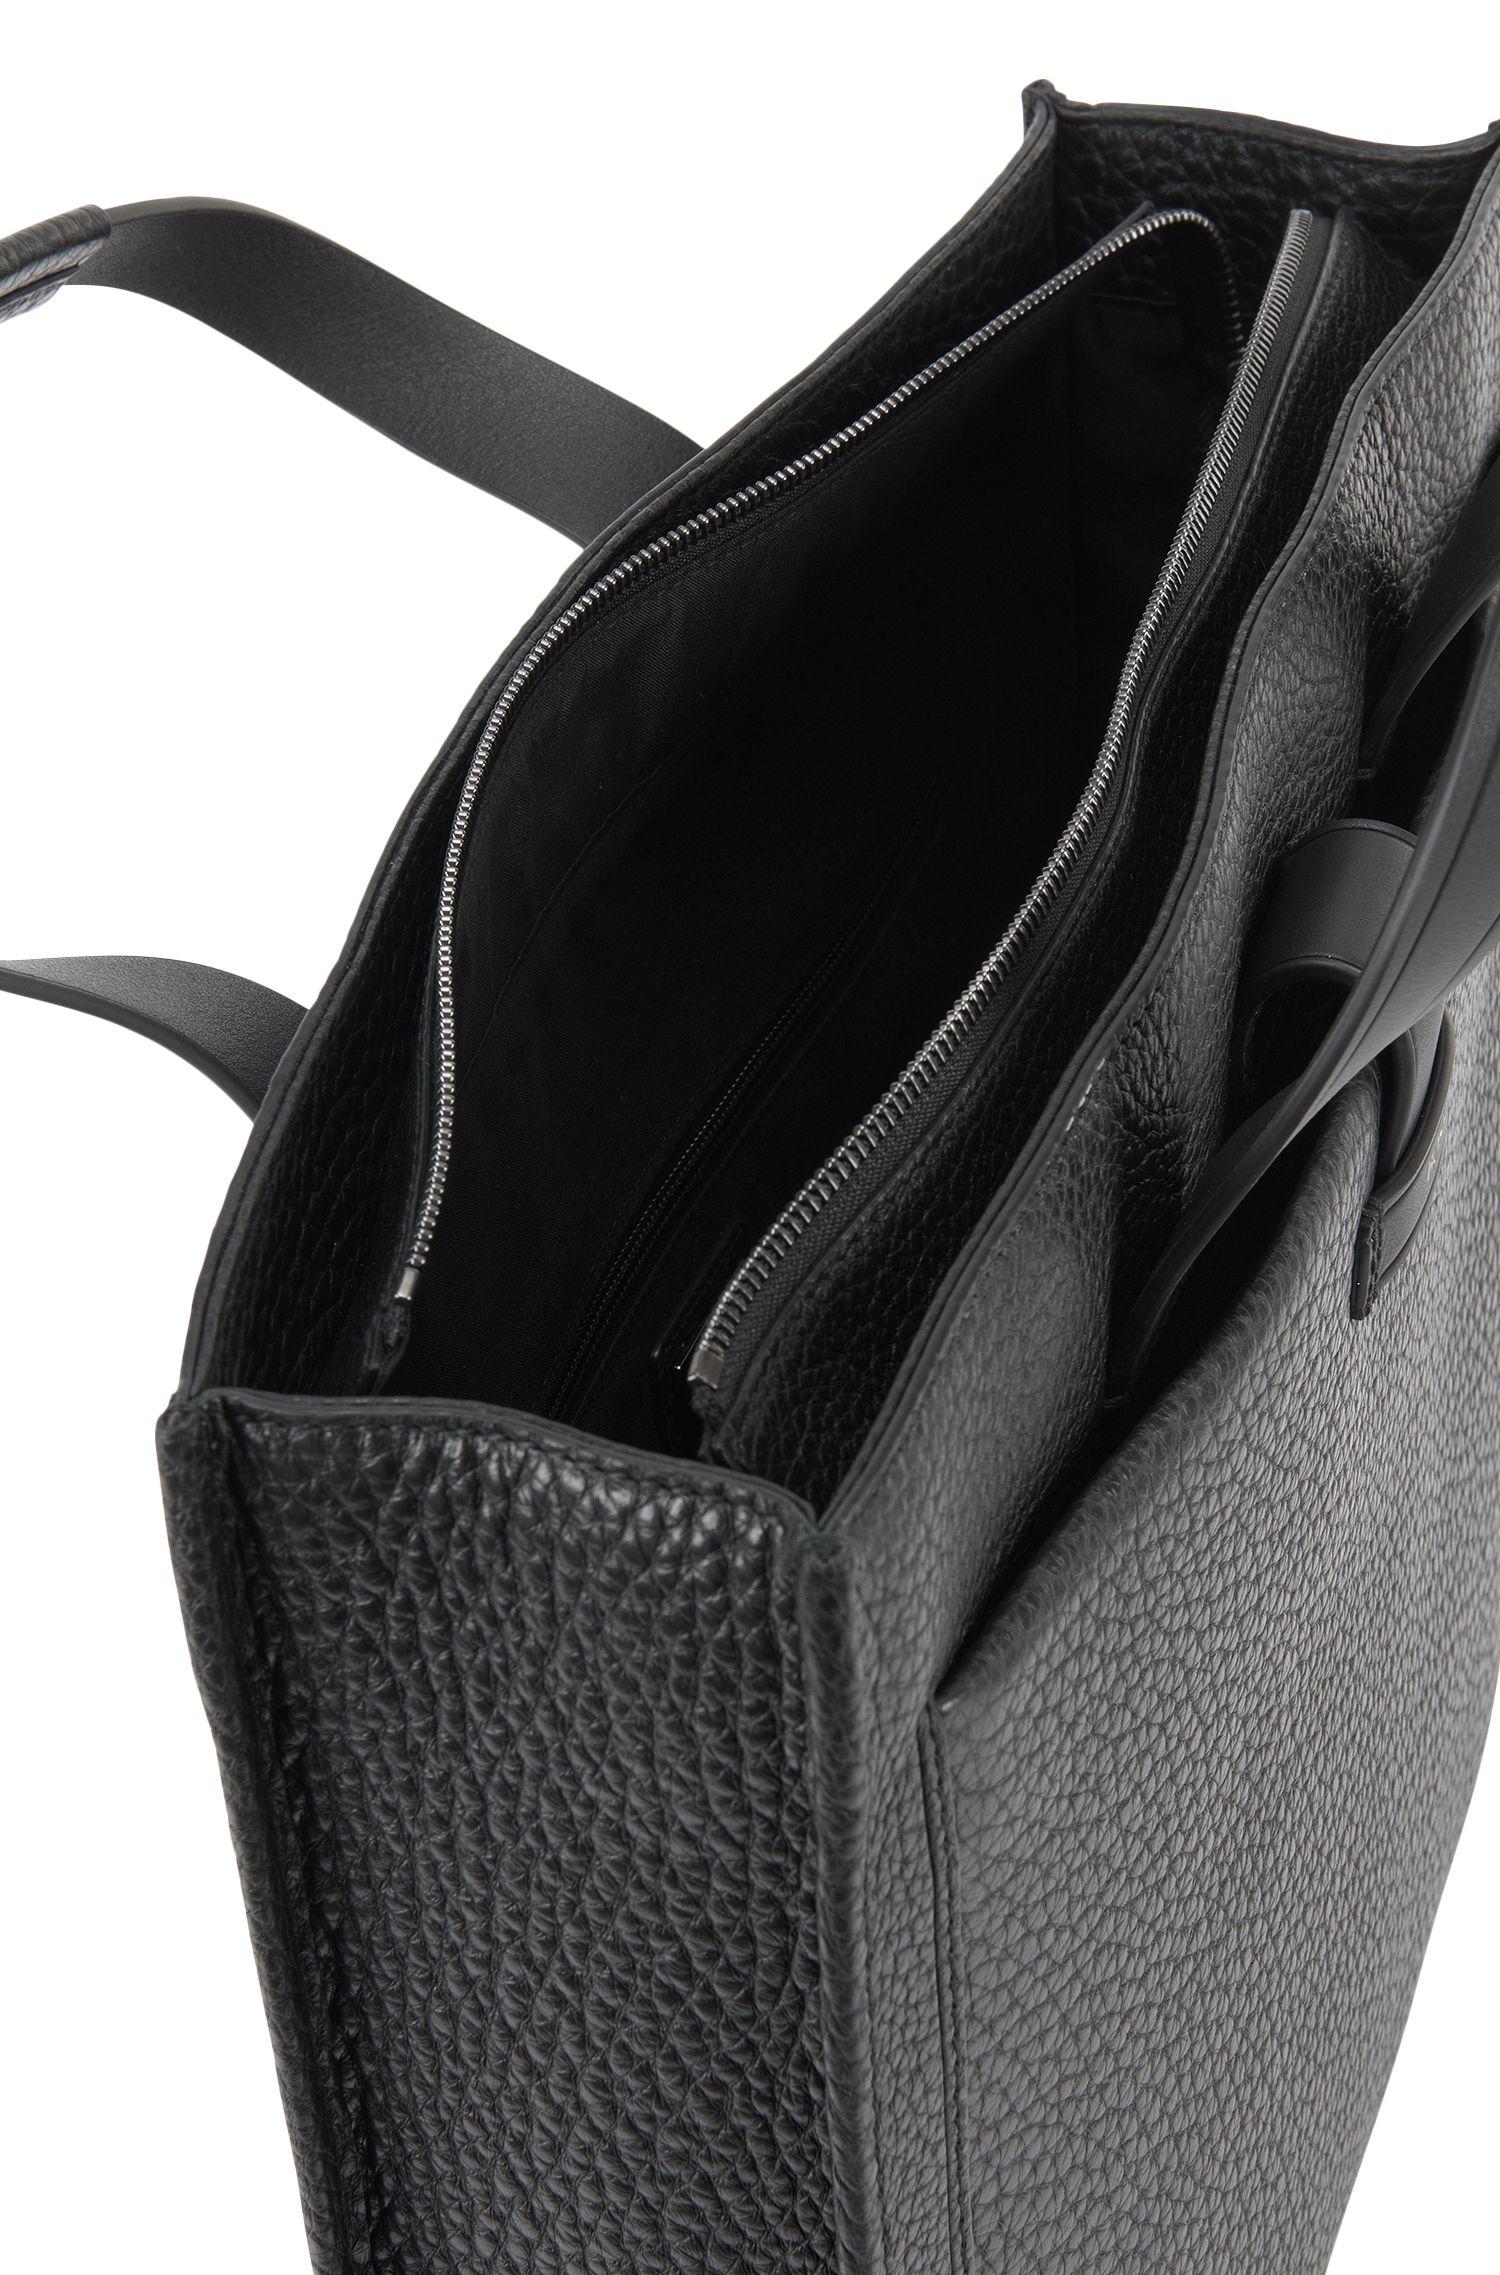 Top-Grain Leather Tote   Varenne Tote, Black